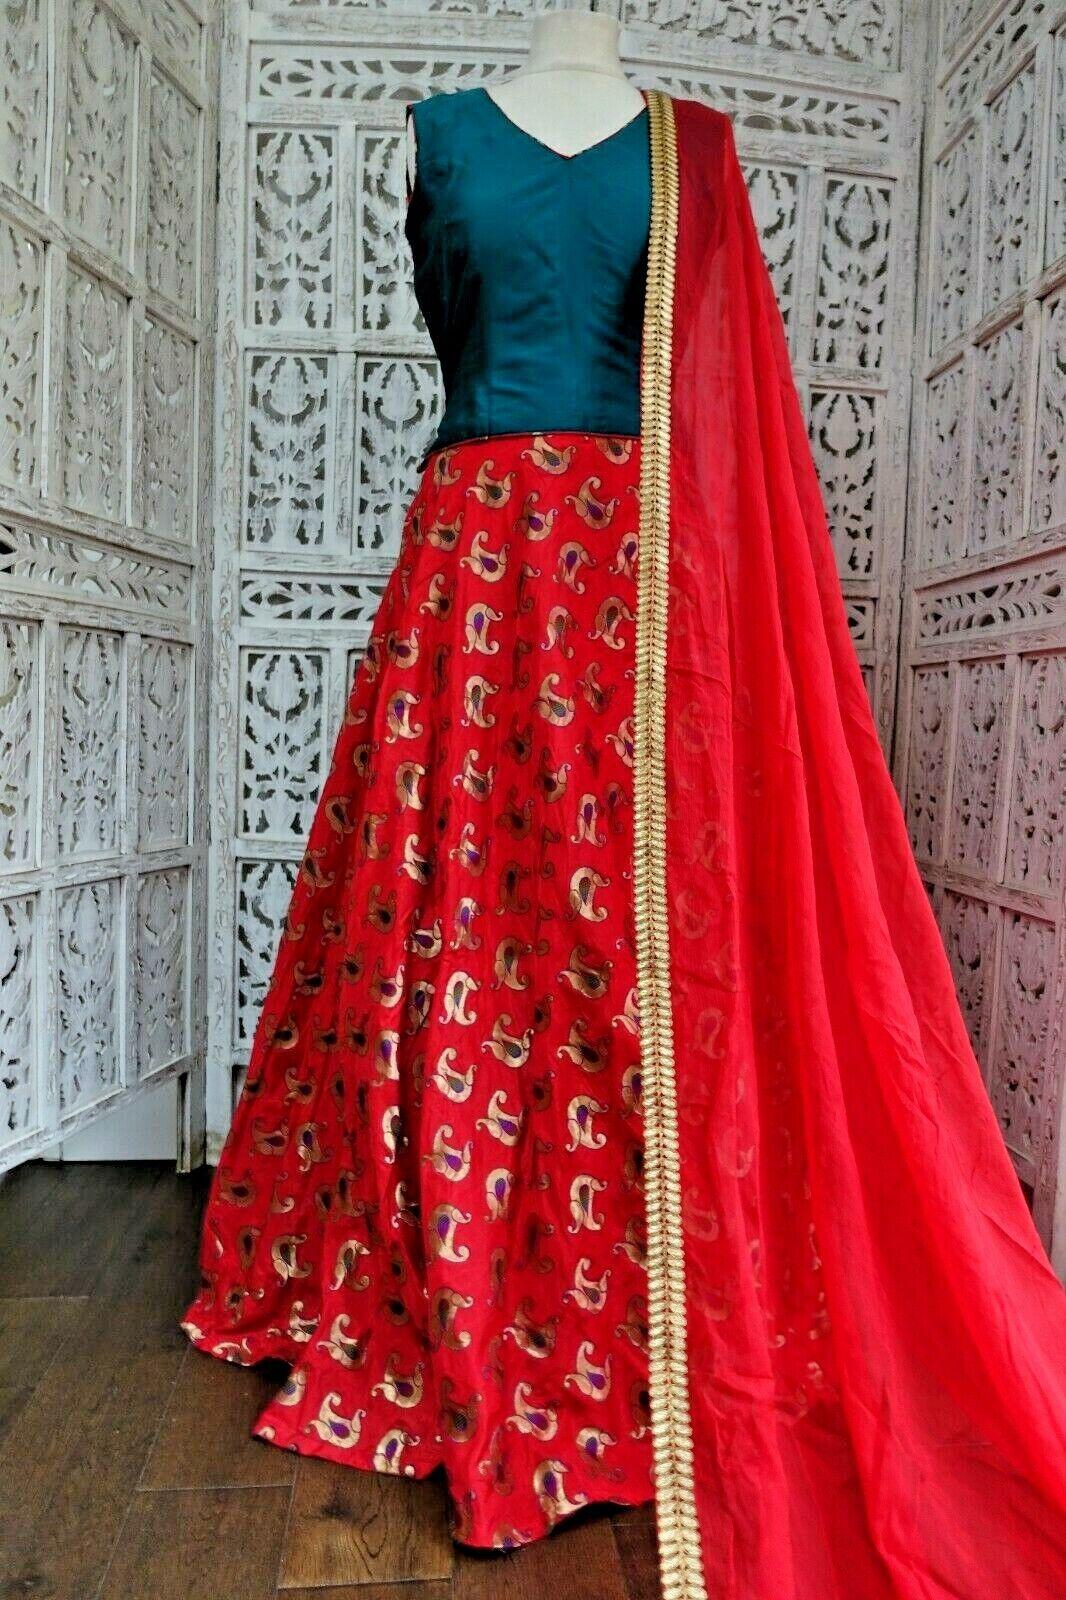 Teal & red silk lengha Bollywood wedding Indian UK 12 EU 38 SKU17154